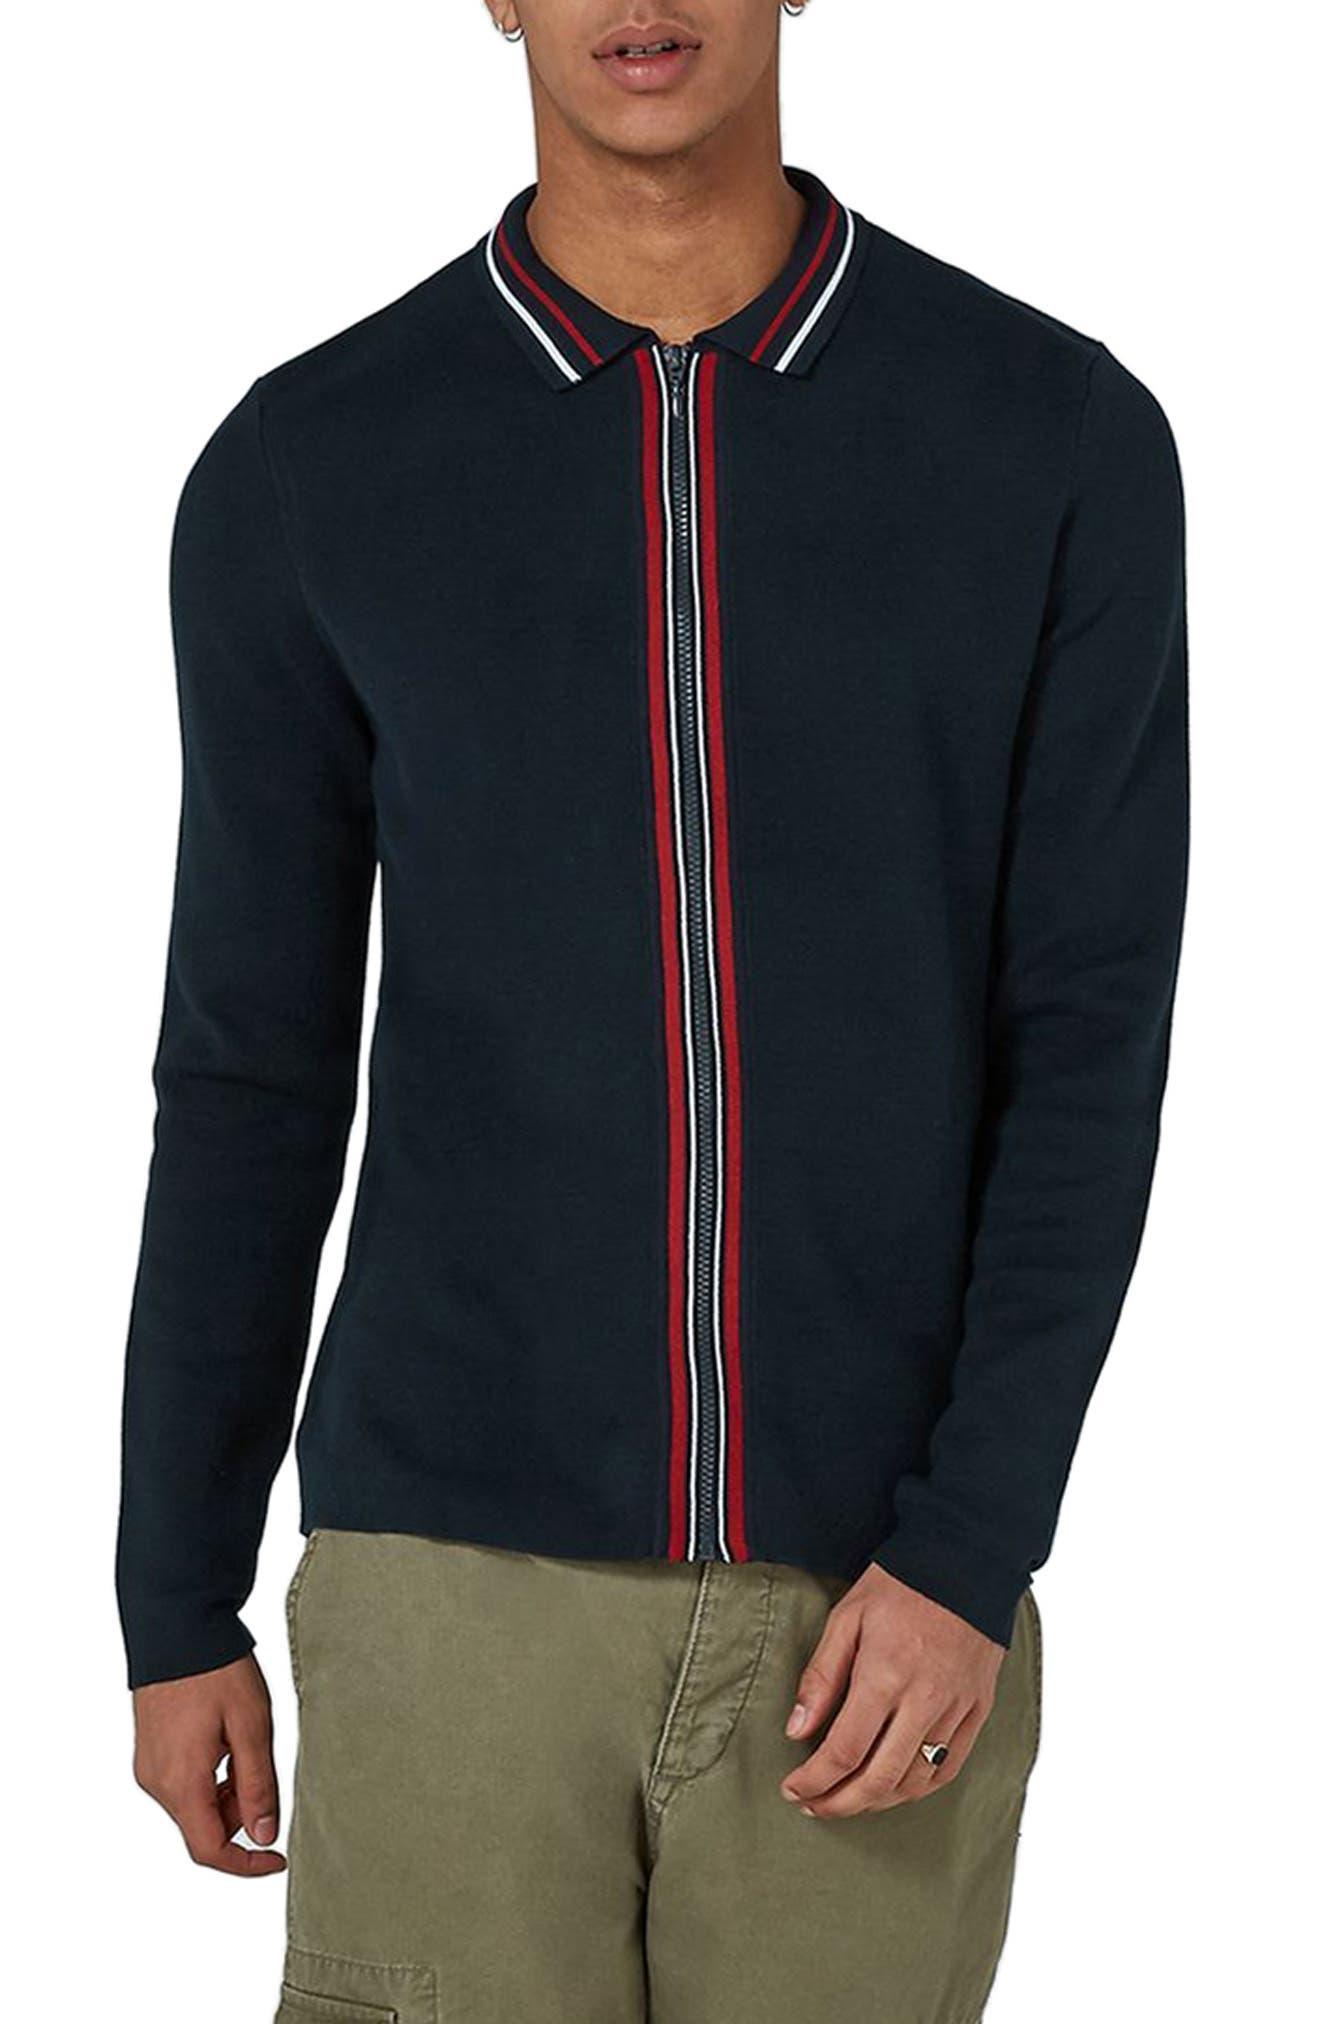 Stripe Knit Zip Front Harrington Sweatshirt,                             Main thumbnail 1, color,                             Navy Blue Multi